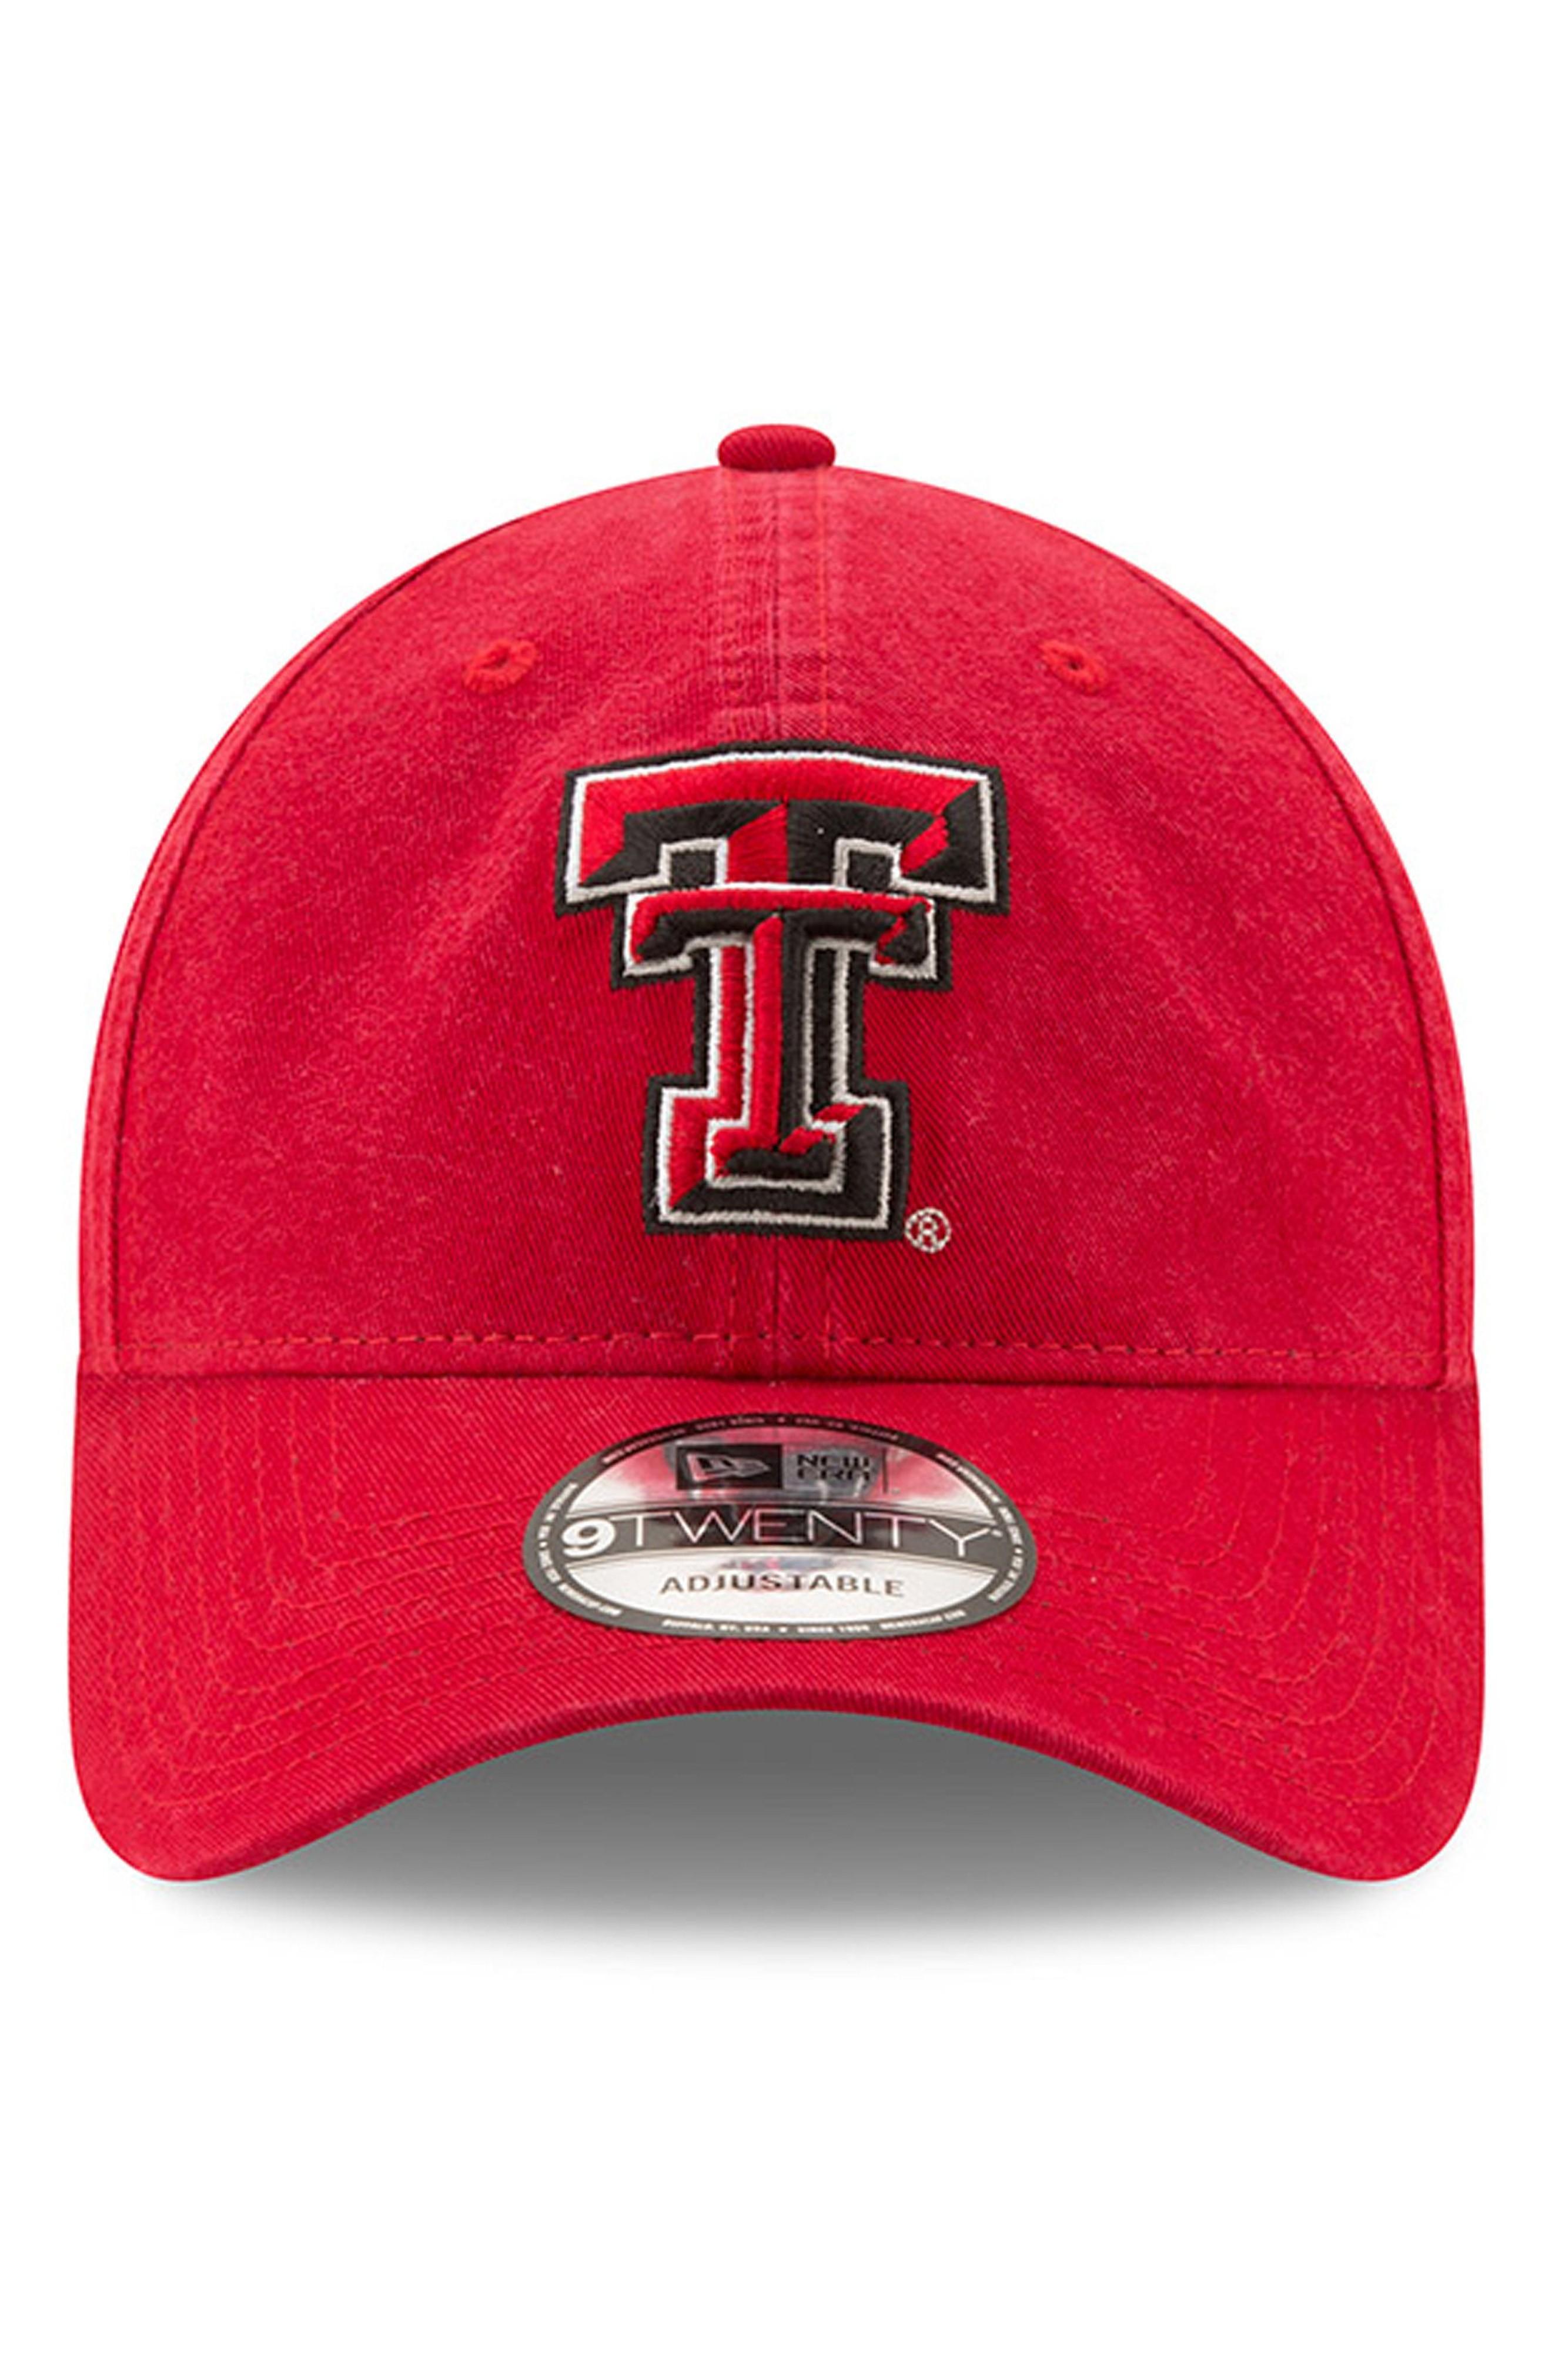 New Era Collegiate Core Classic - Texas Tech Red Raiders Baseball Cap - Red